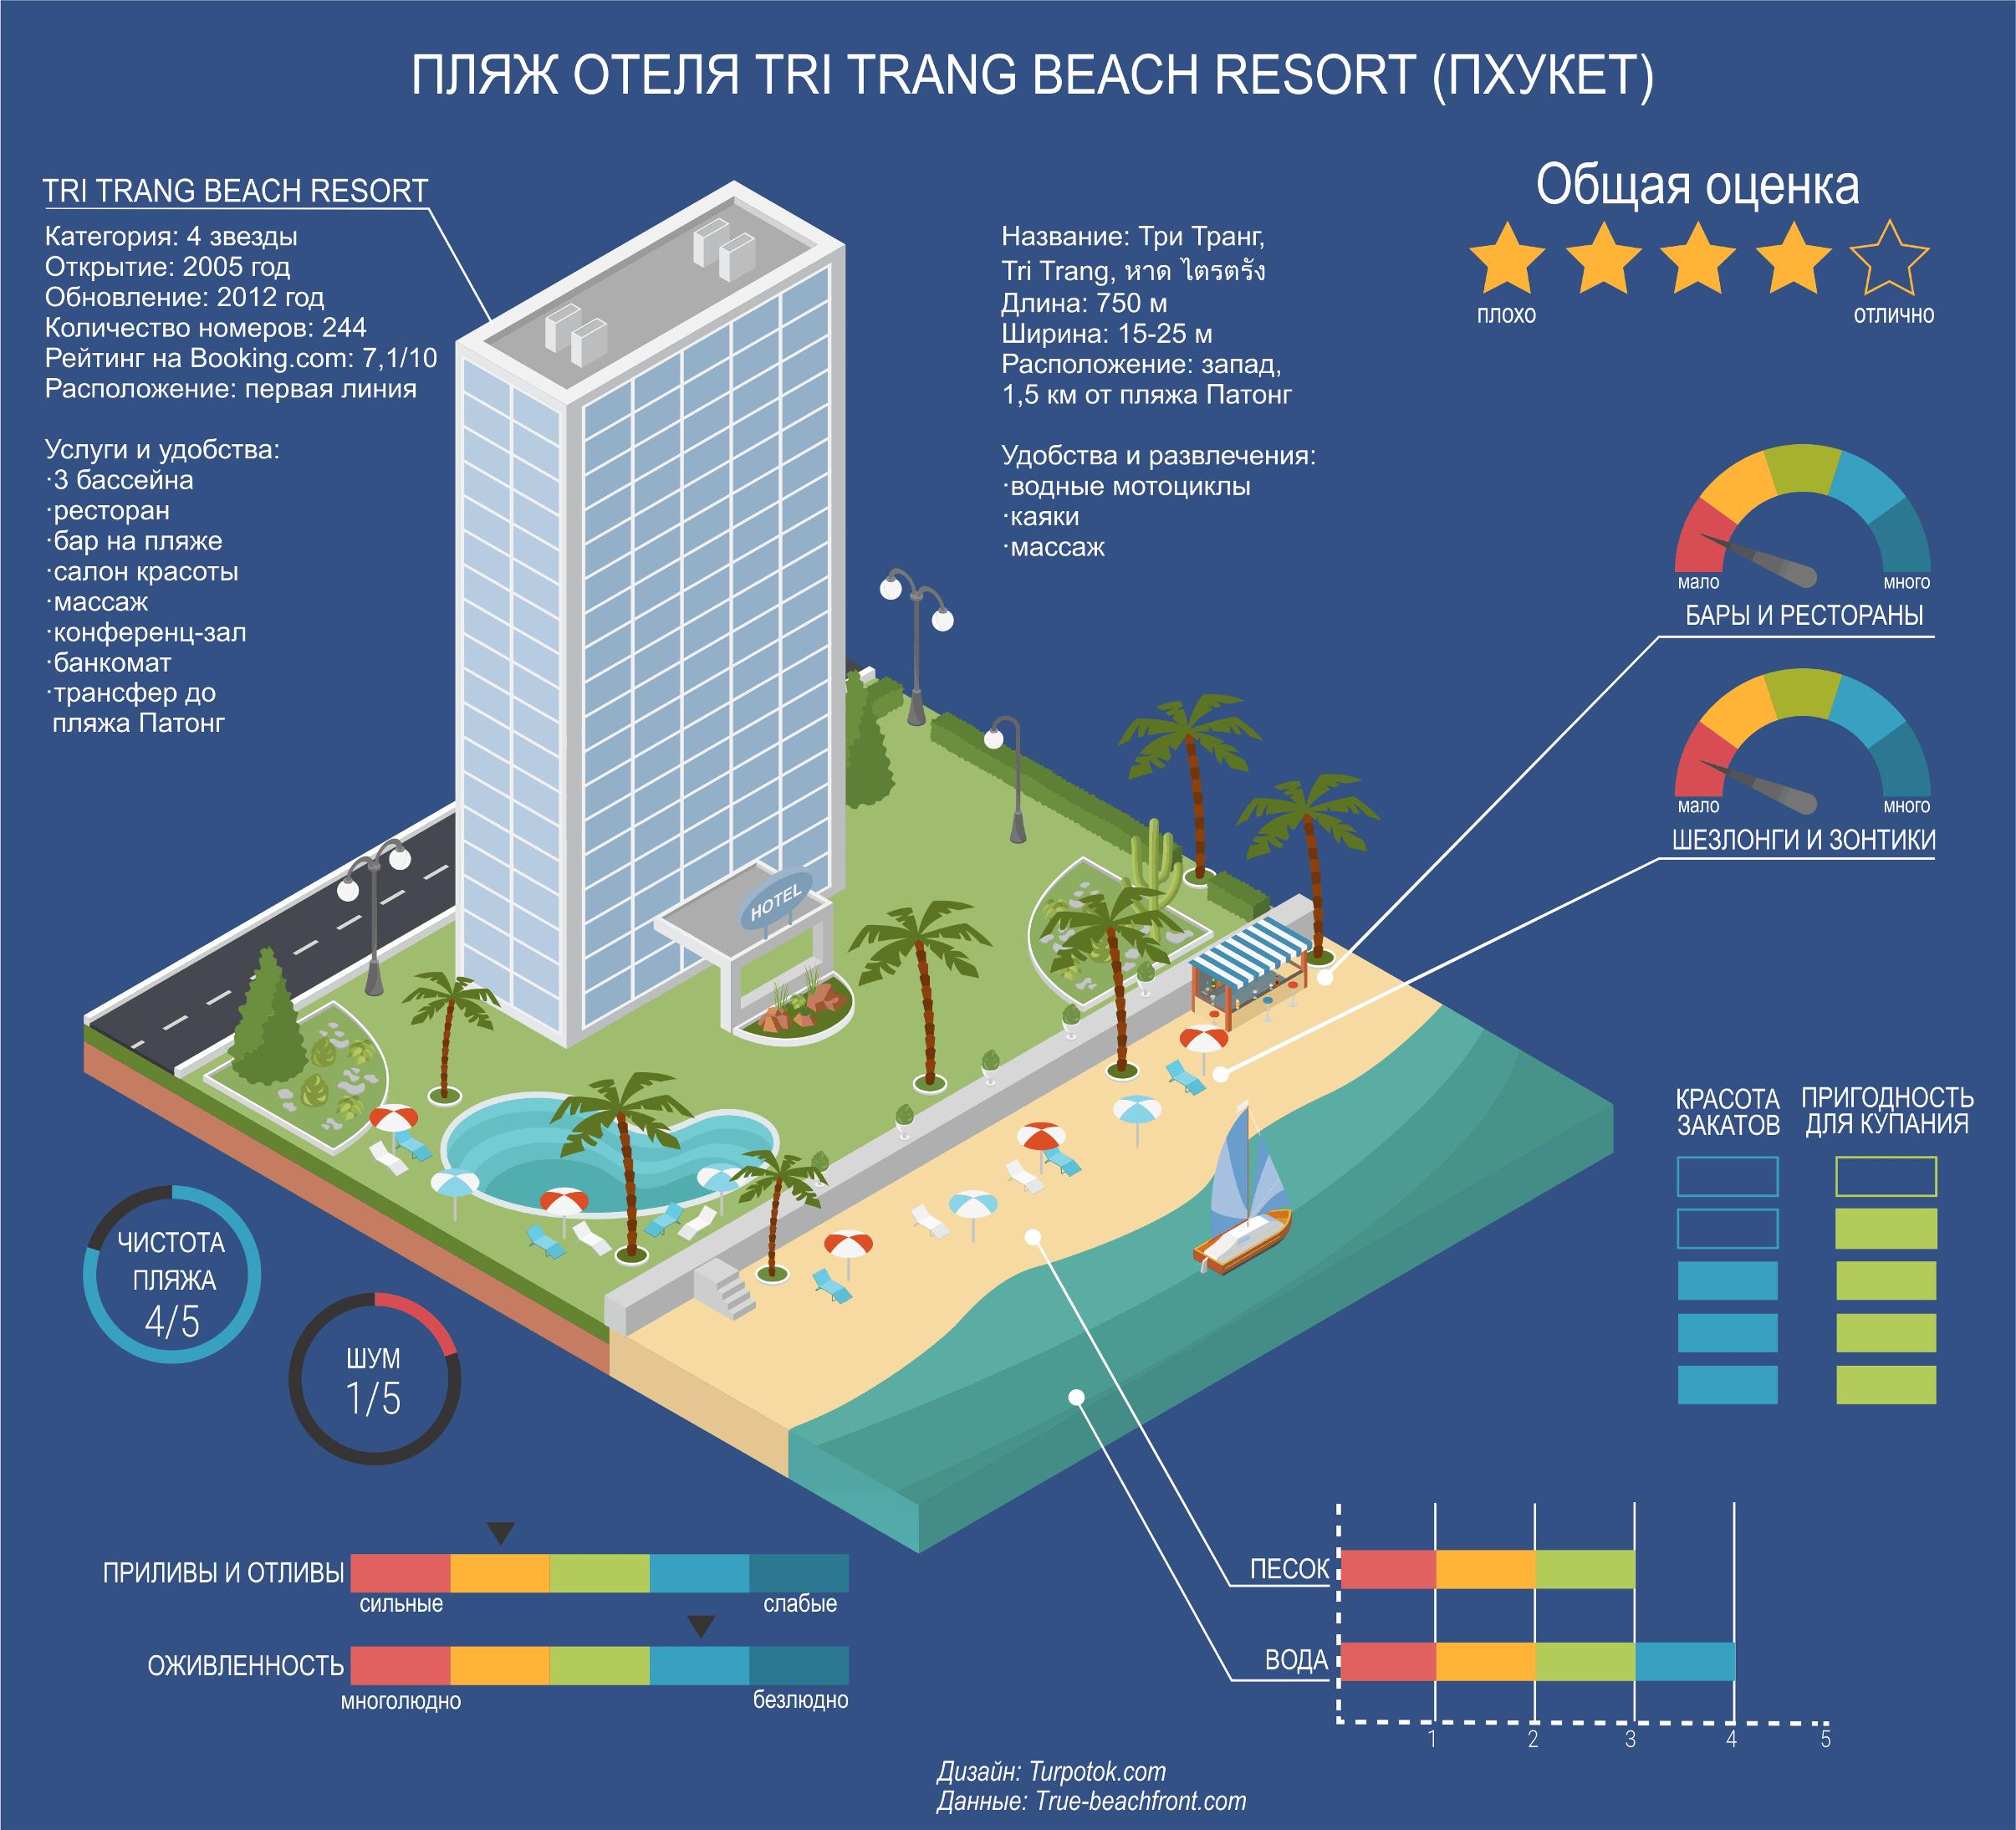 Инфографика с оценками пляжу Три Транг на Пхукете (Таиланд)